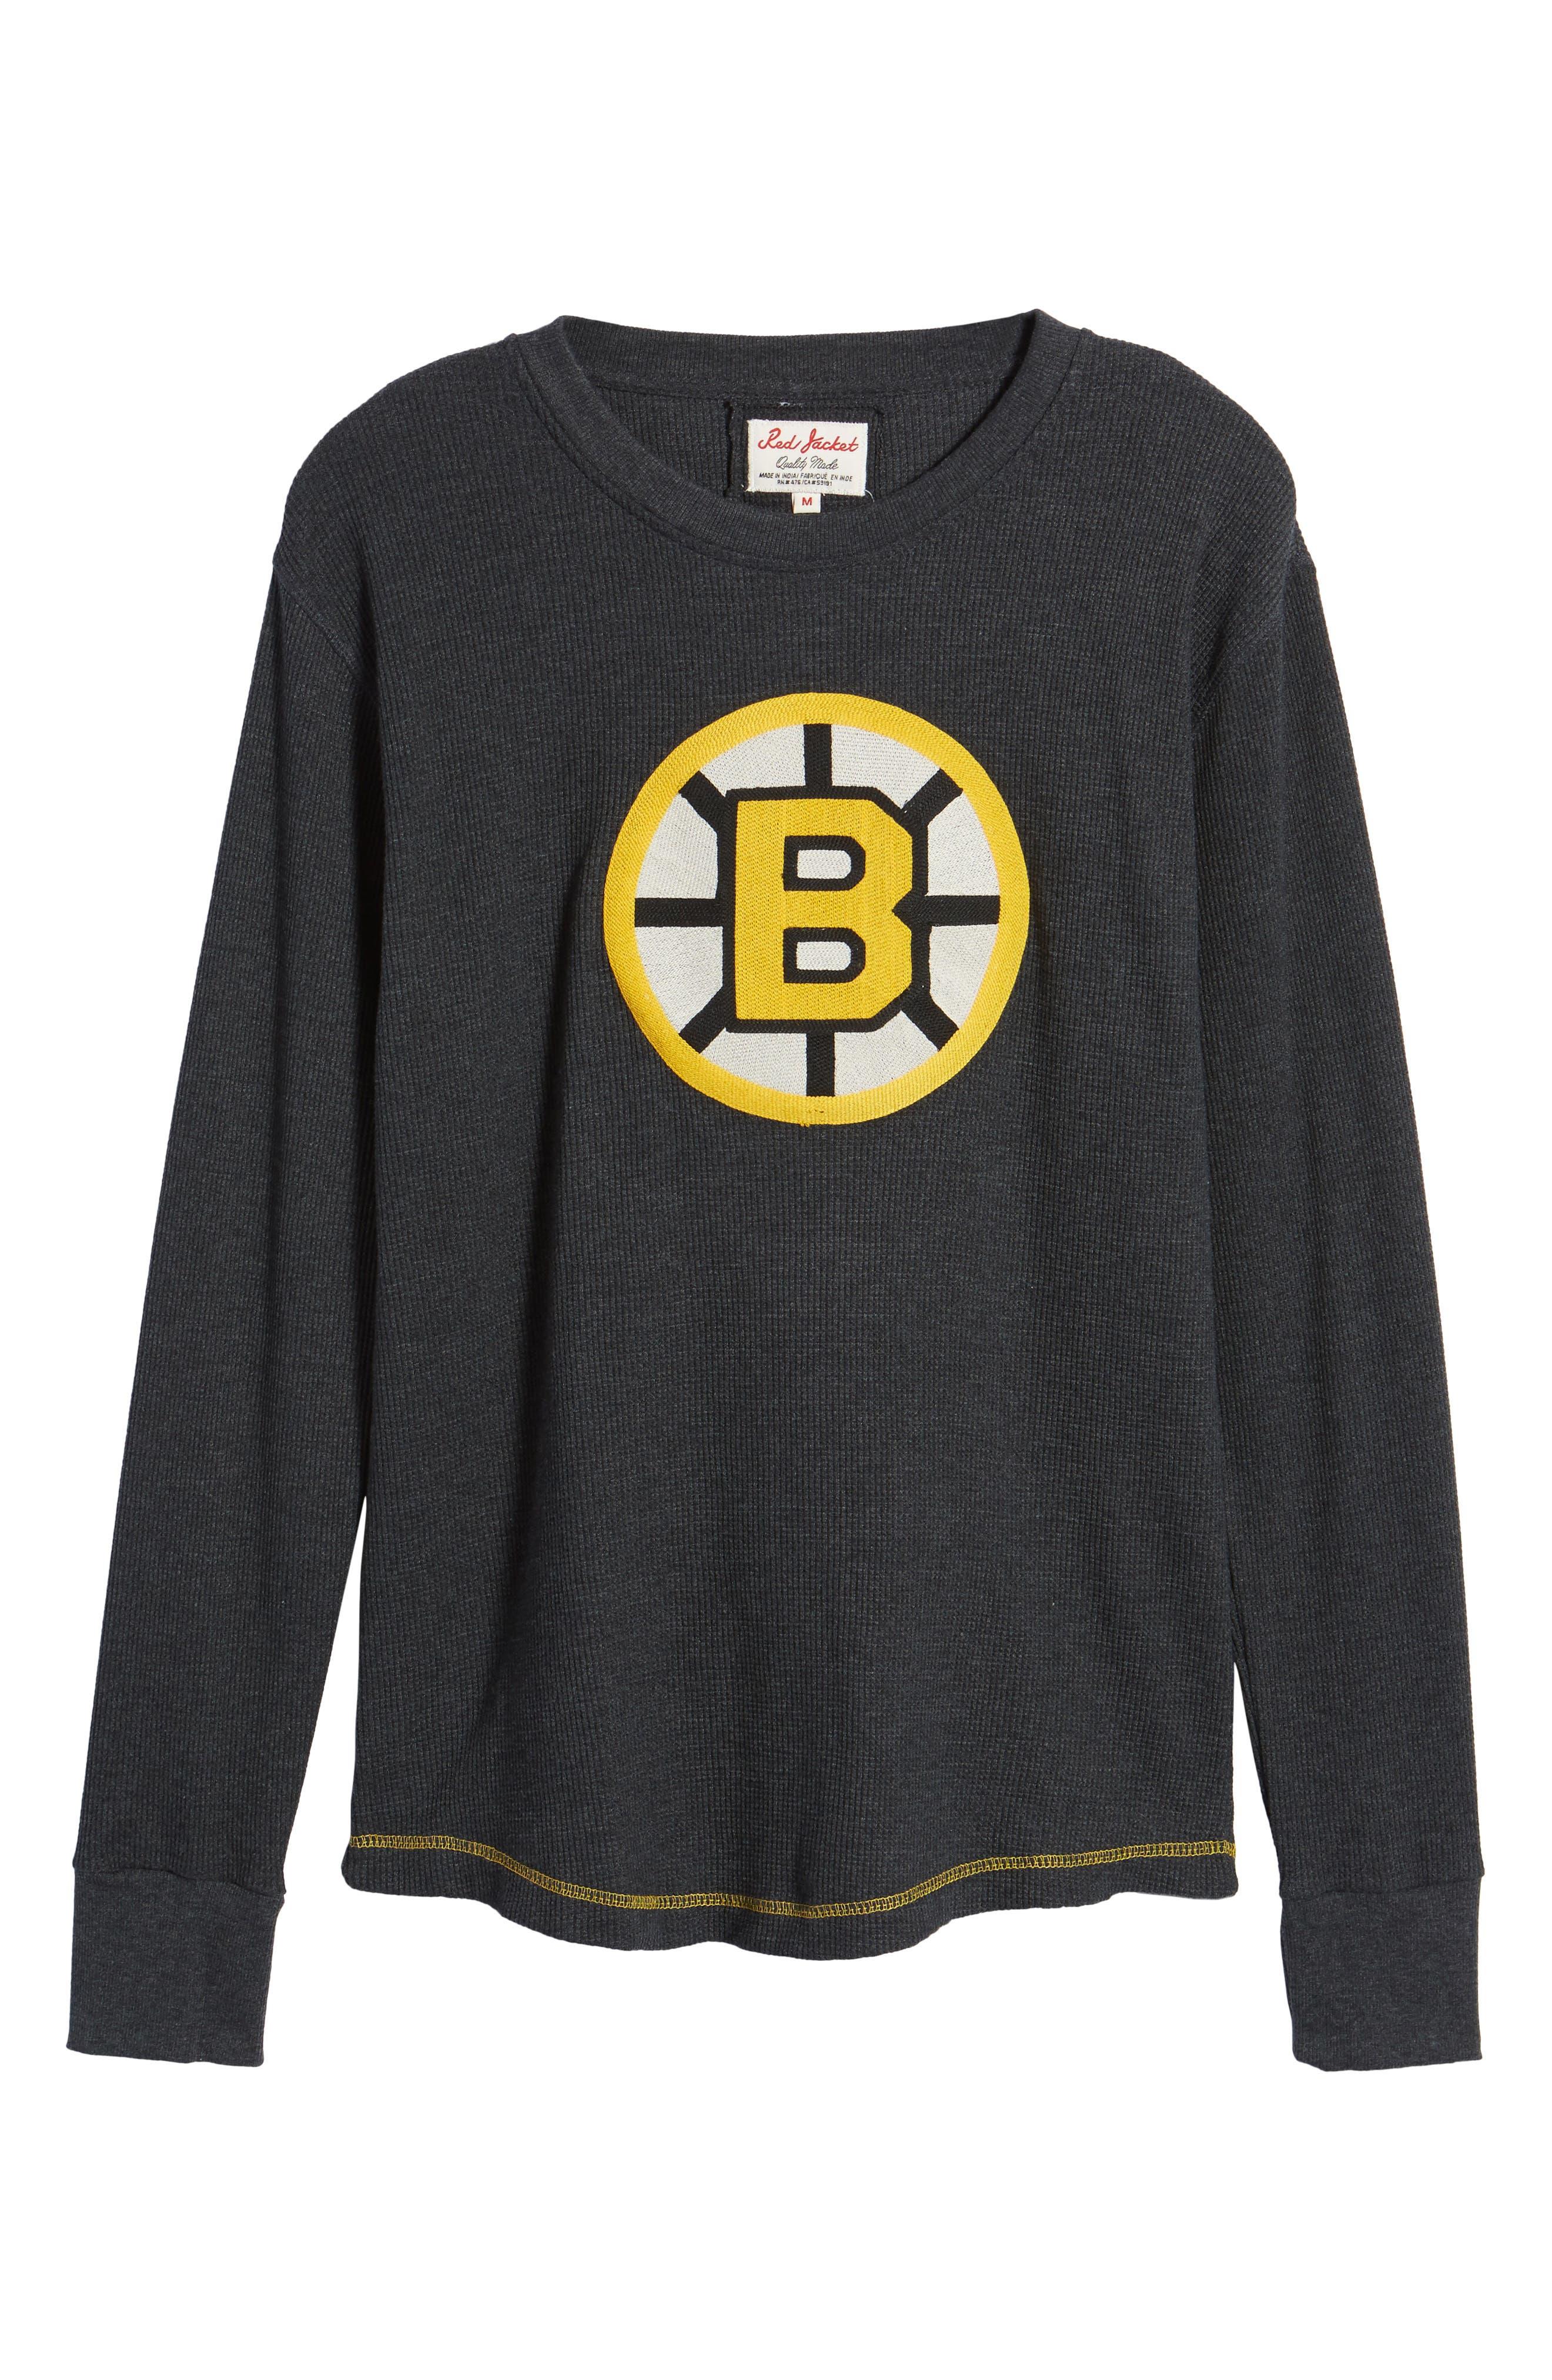 Boston Bruins Embroidered Long Sleeve Thermal Shirt,                             Alternate thumbnail 6, color,                             Black